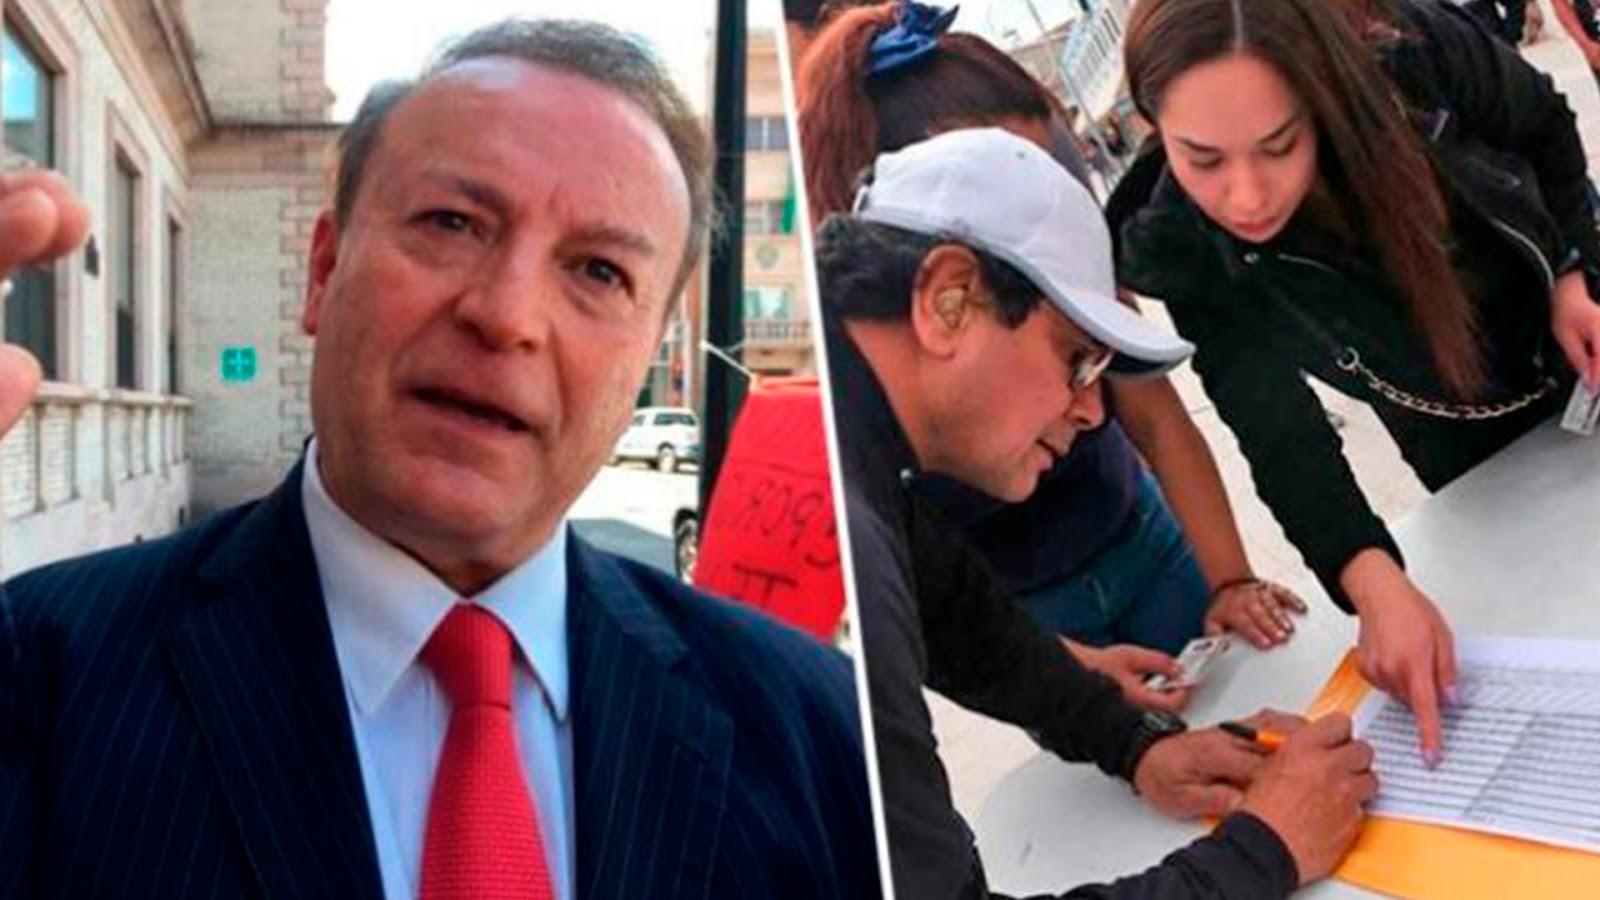 Mexicanos reúnen 20 mil firmas para enjuiciar a Gilberto Lozano por incitar a atentar contra AMLO